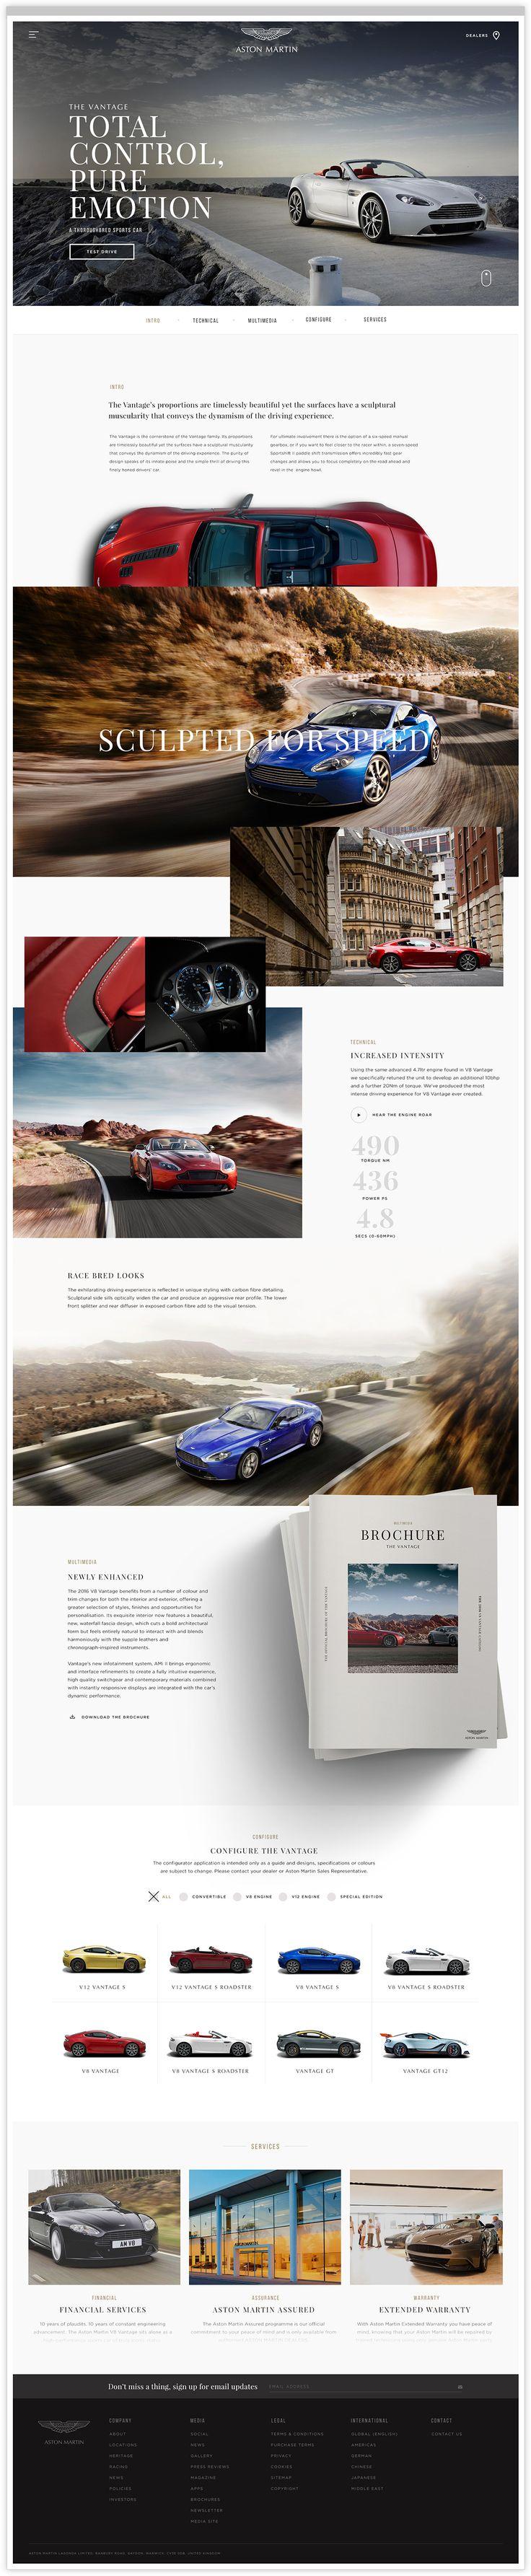 Aston Martin Homepage